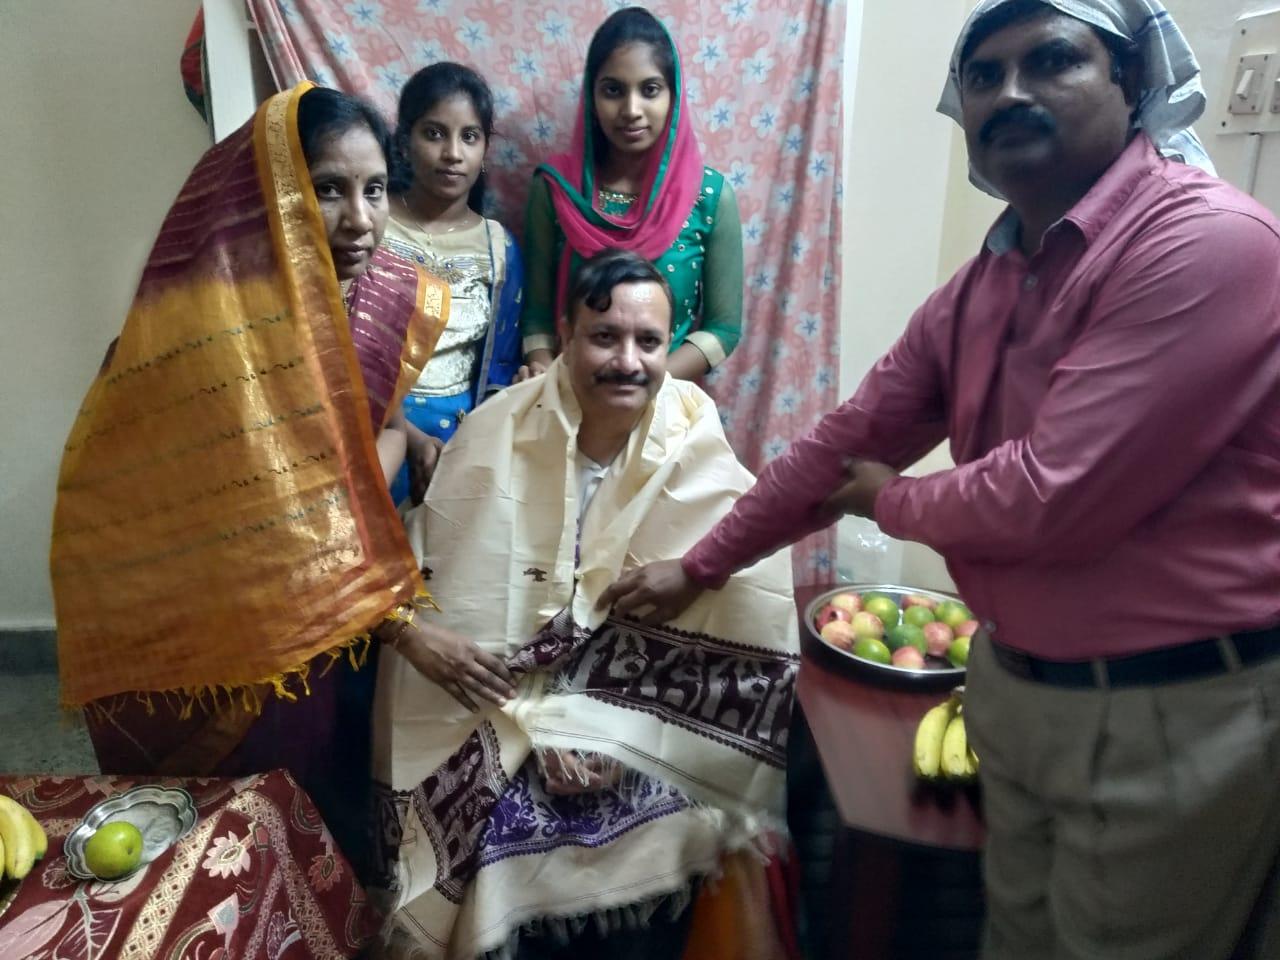 01-BhattuNatraj-Aaradhana-Hyderabad-SVVVAP-01092019